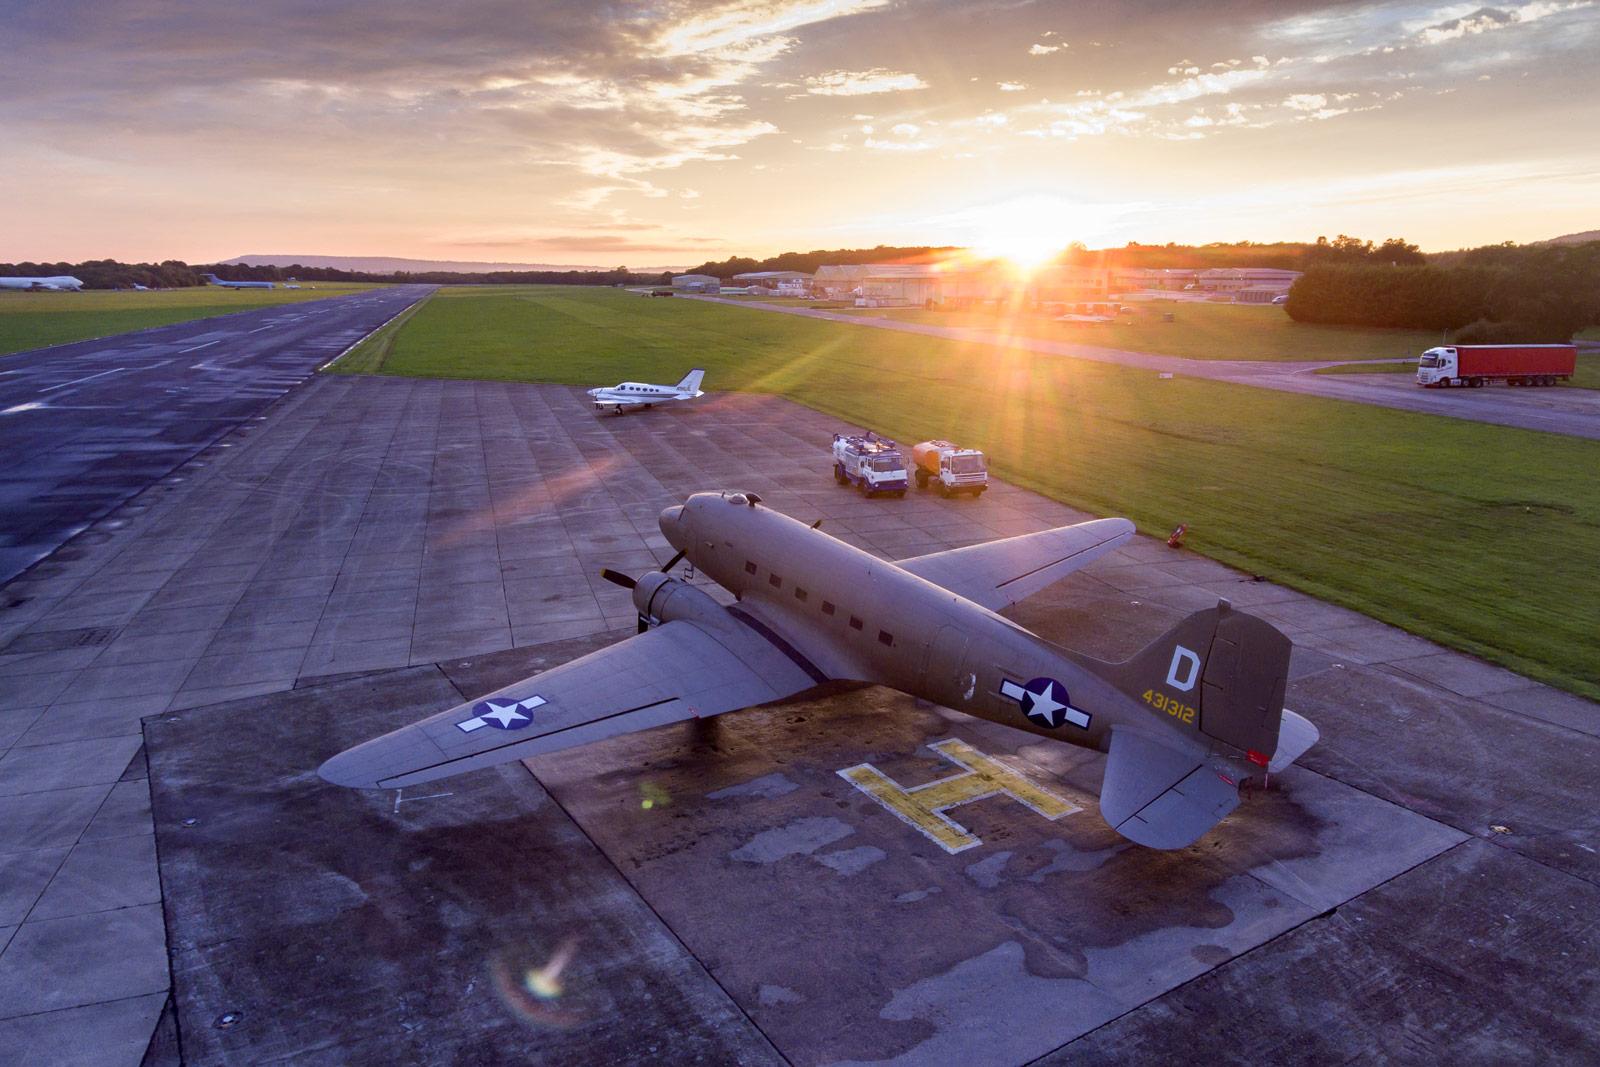 Douglas DC3, England © Kollektiv25